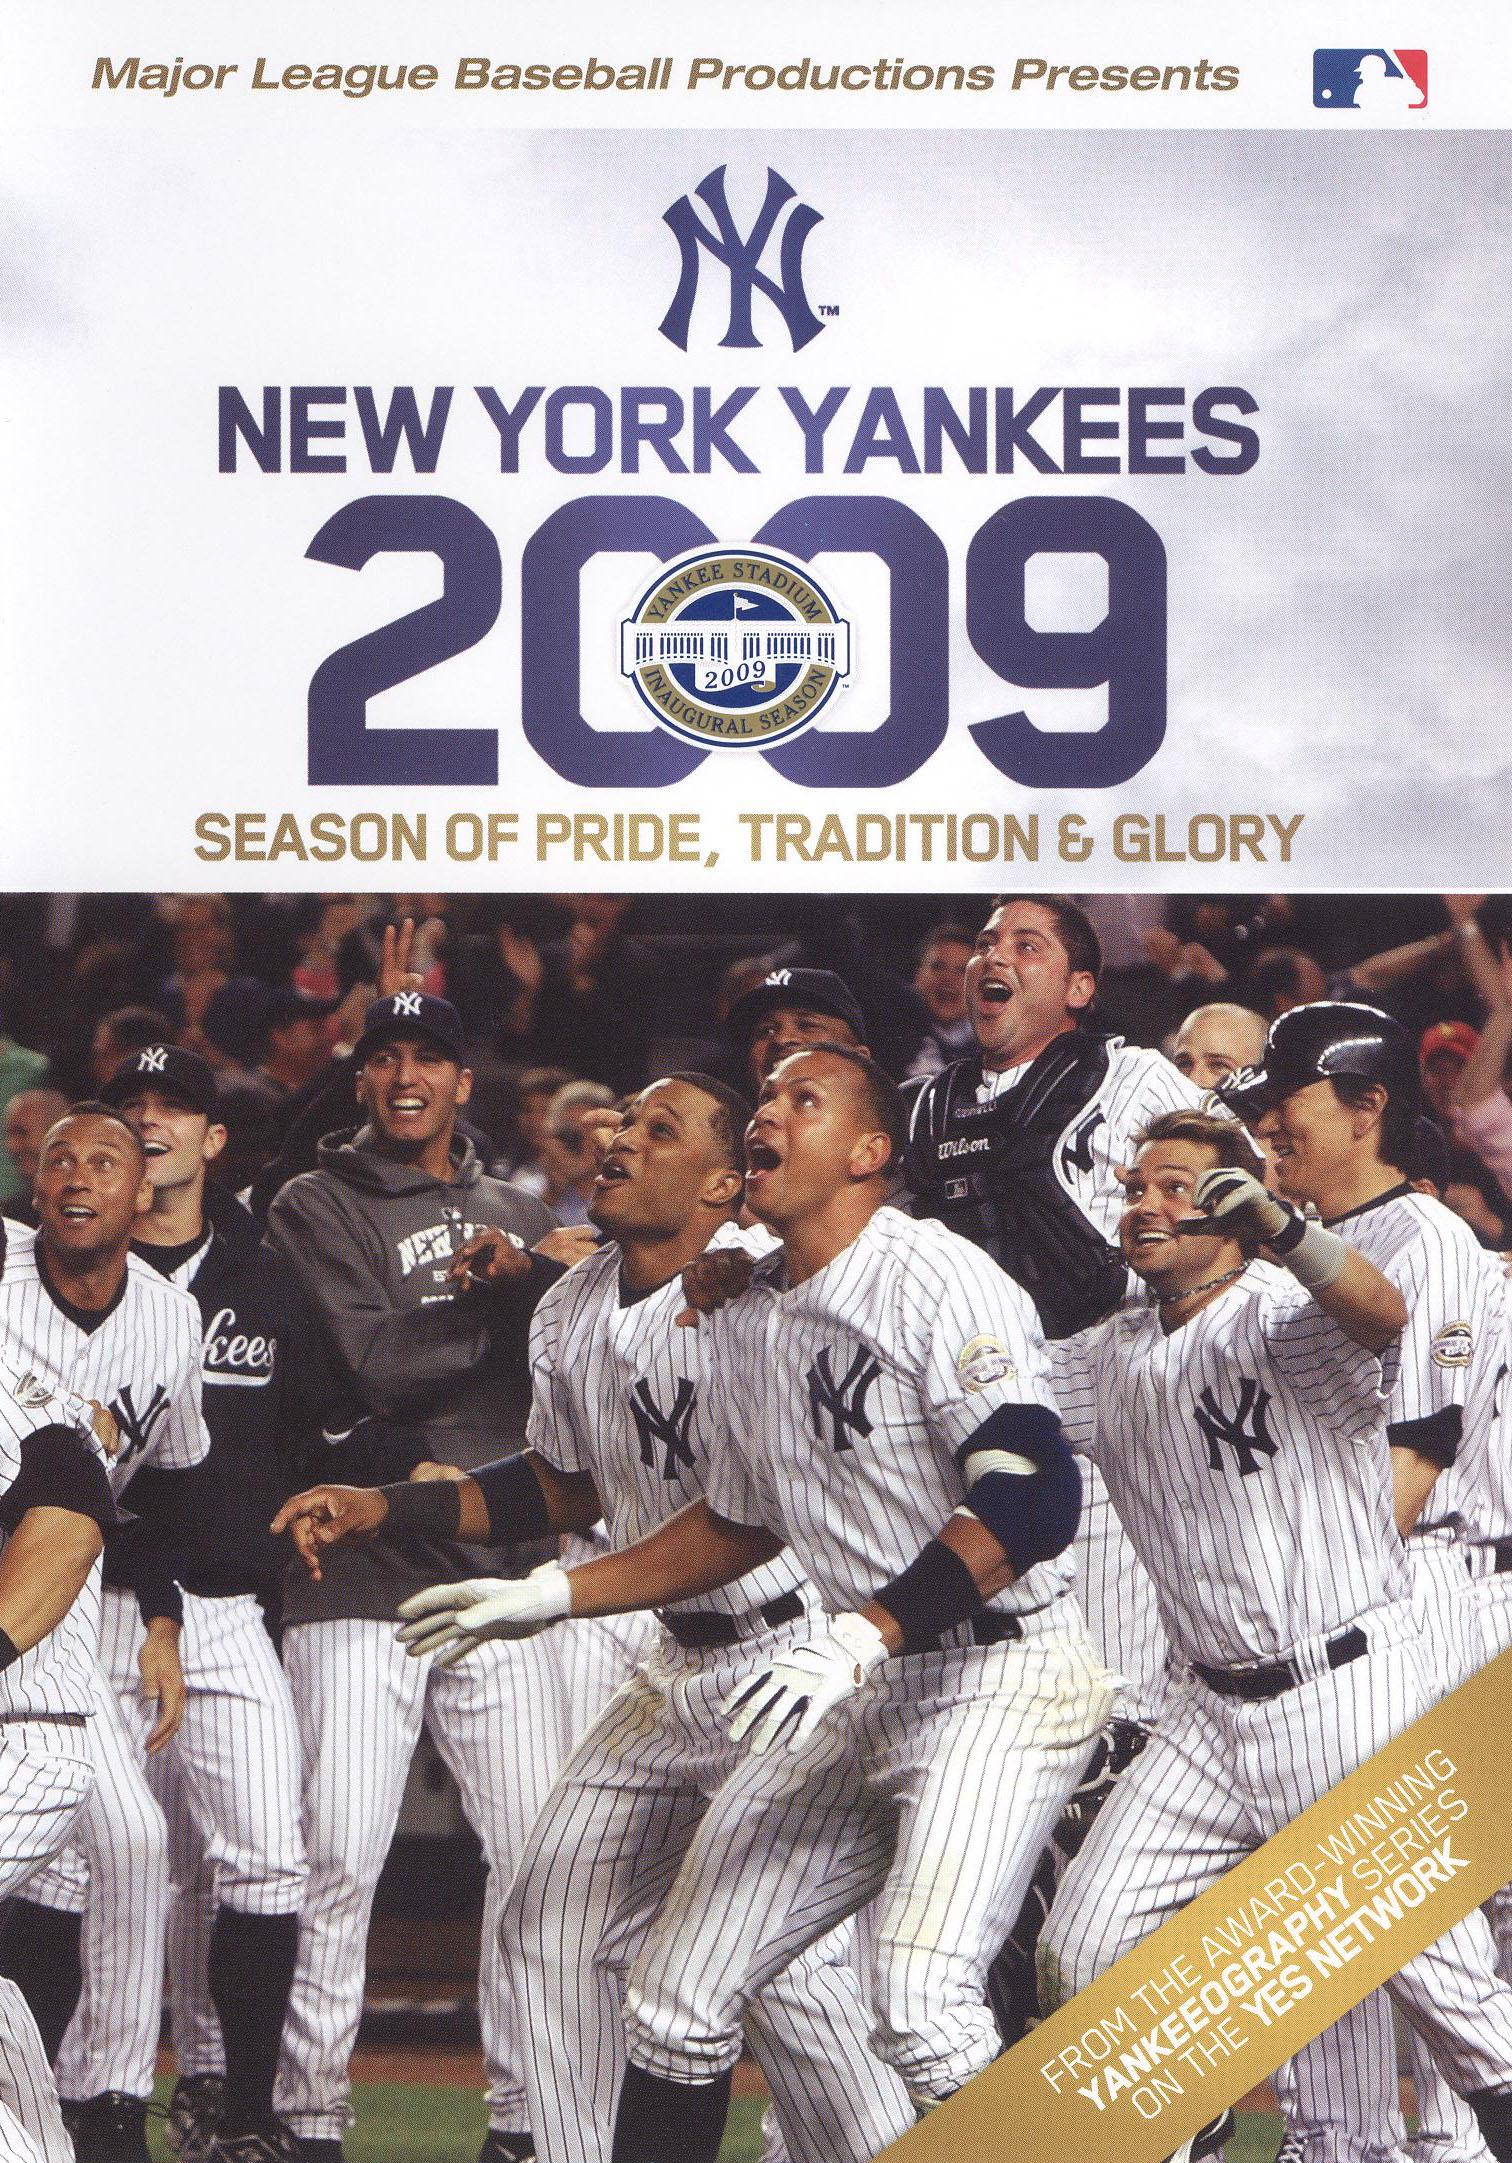 MLB: New York Yankees 2009 - Season of Pride, Traditions & Glory